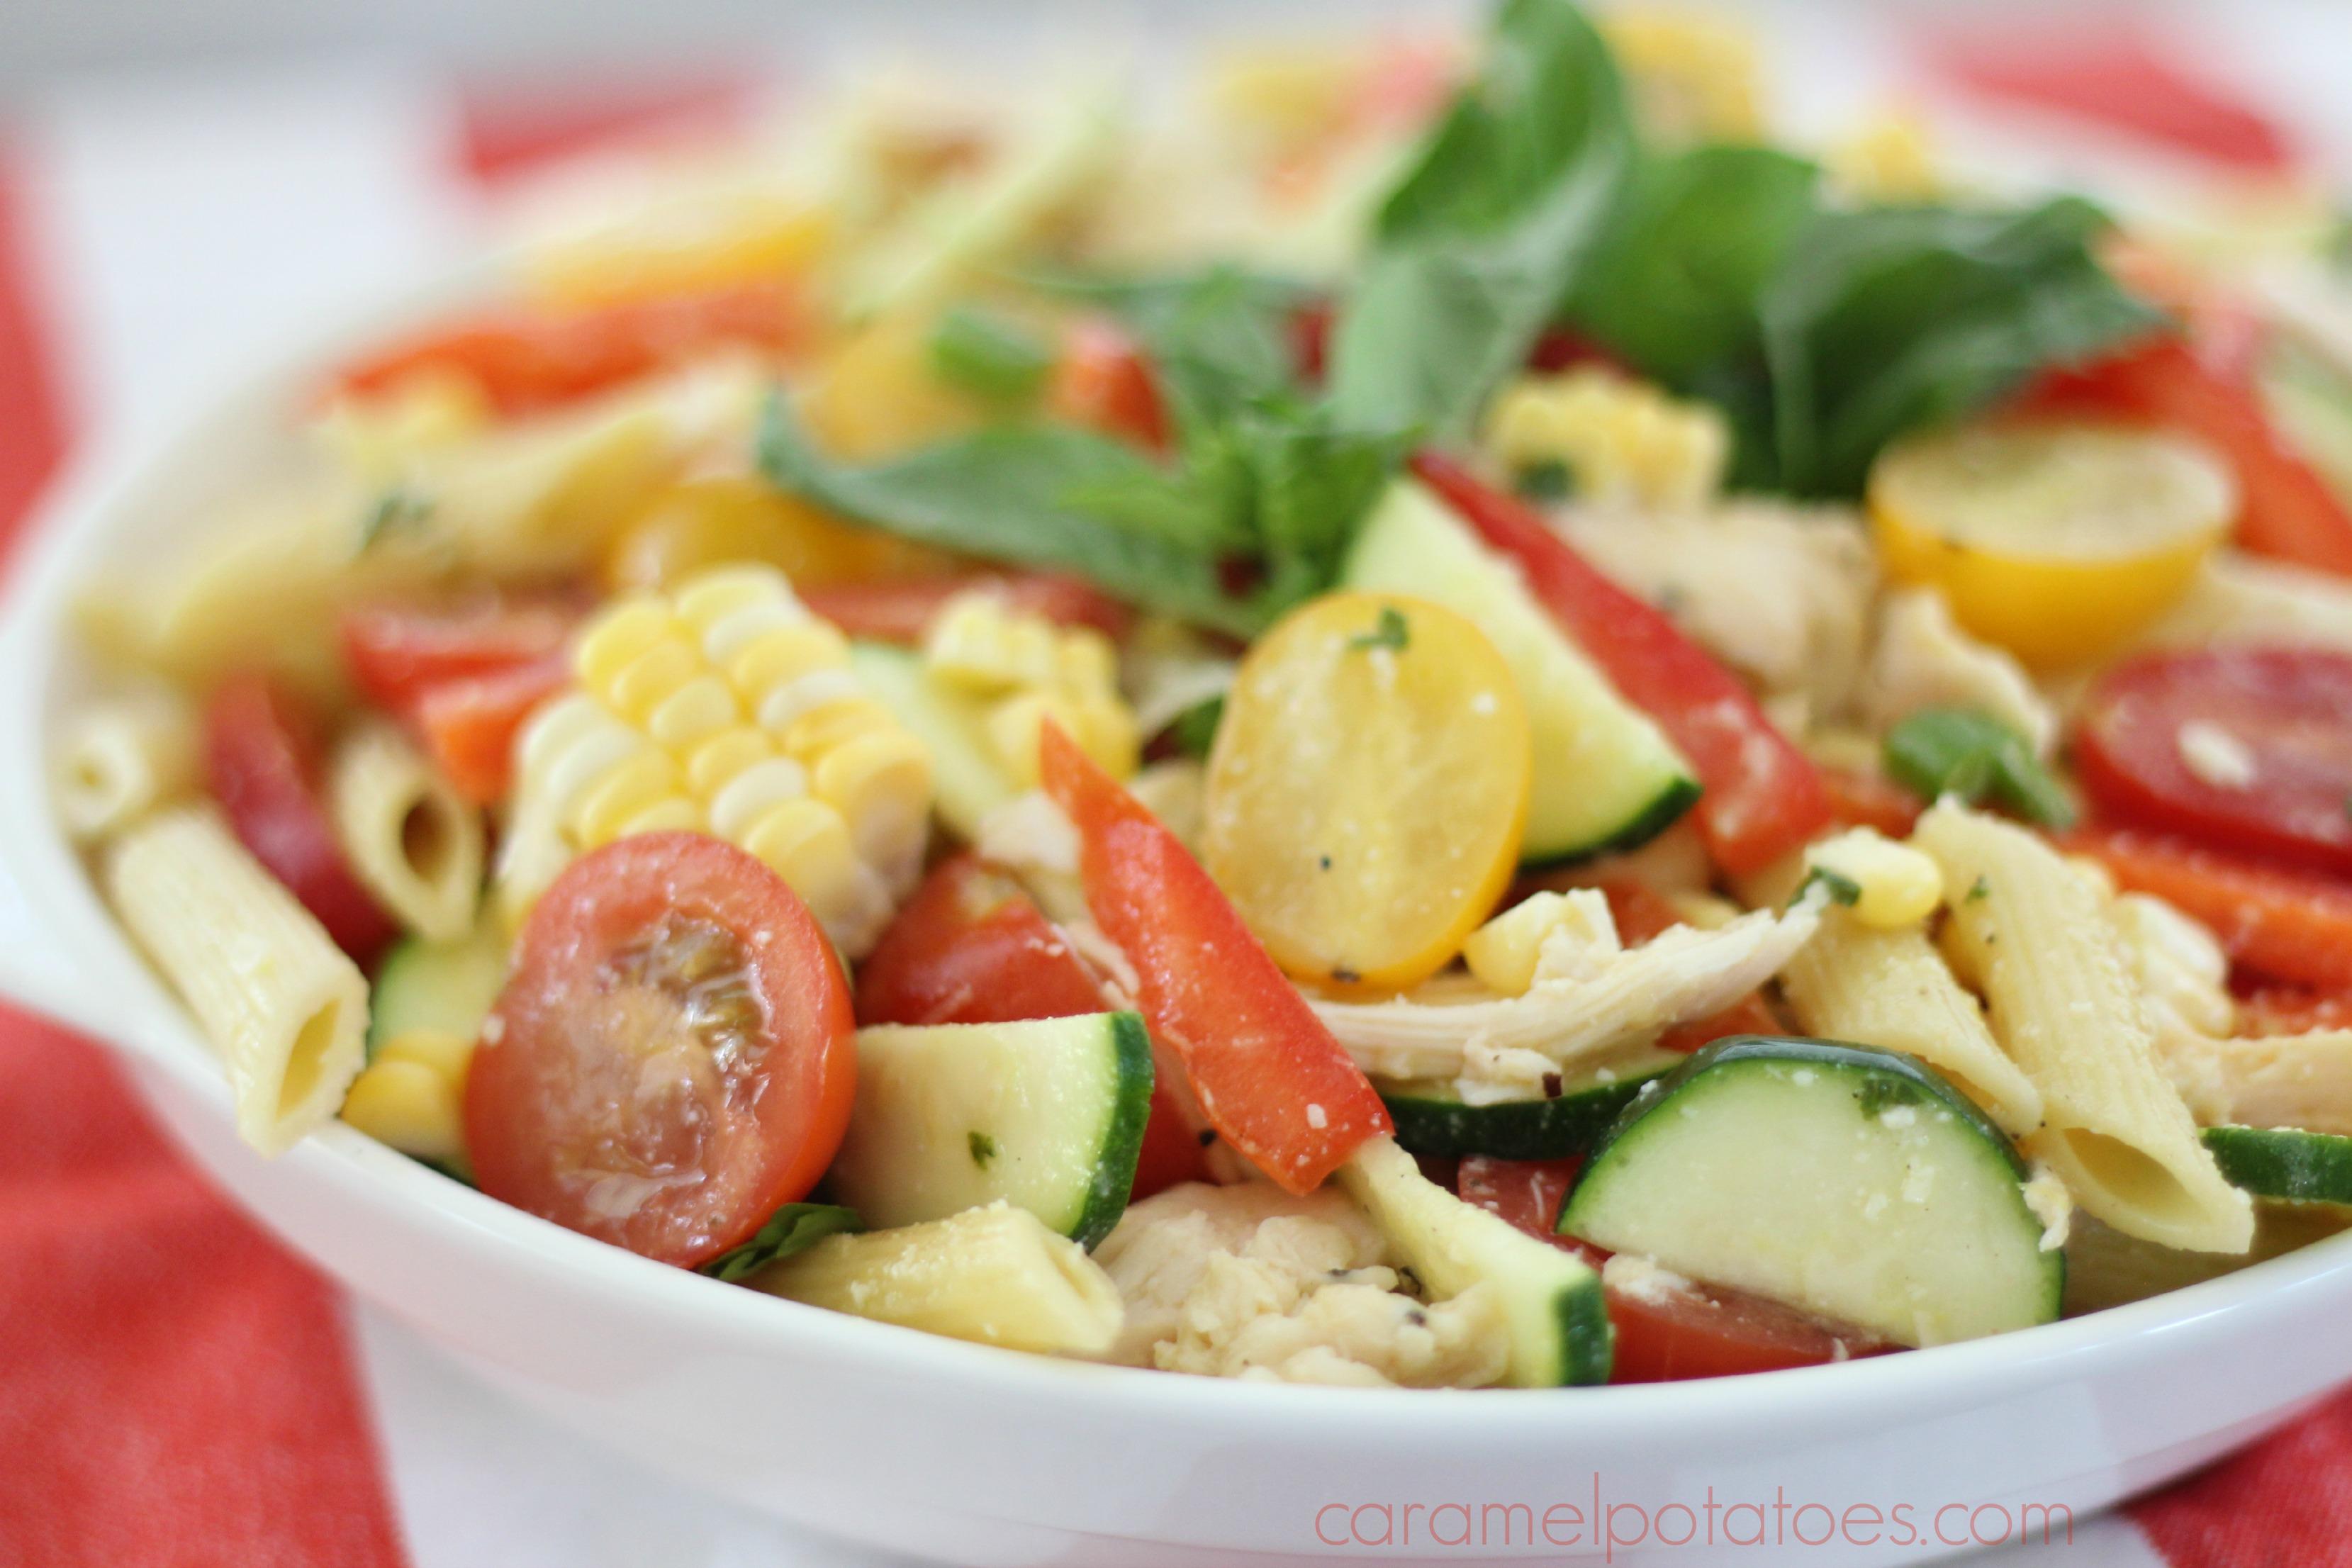 Farmers Market Pasta Salad recommendations